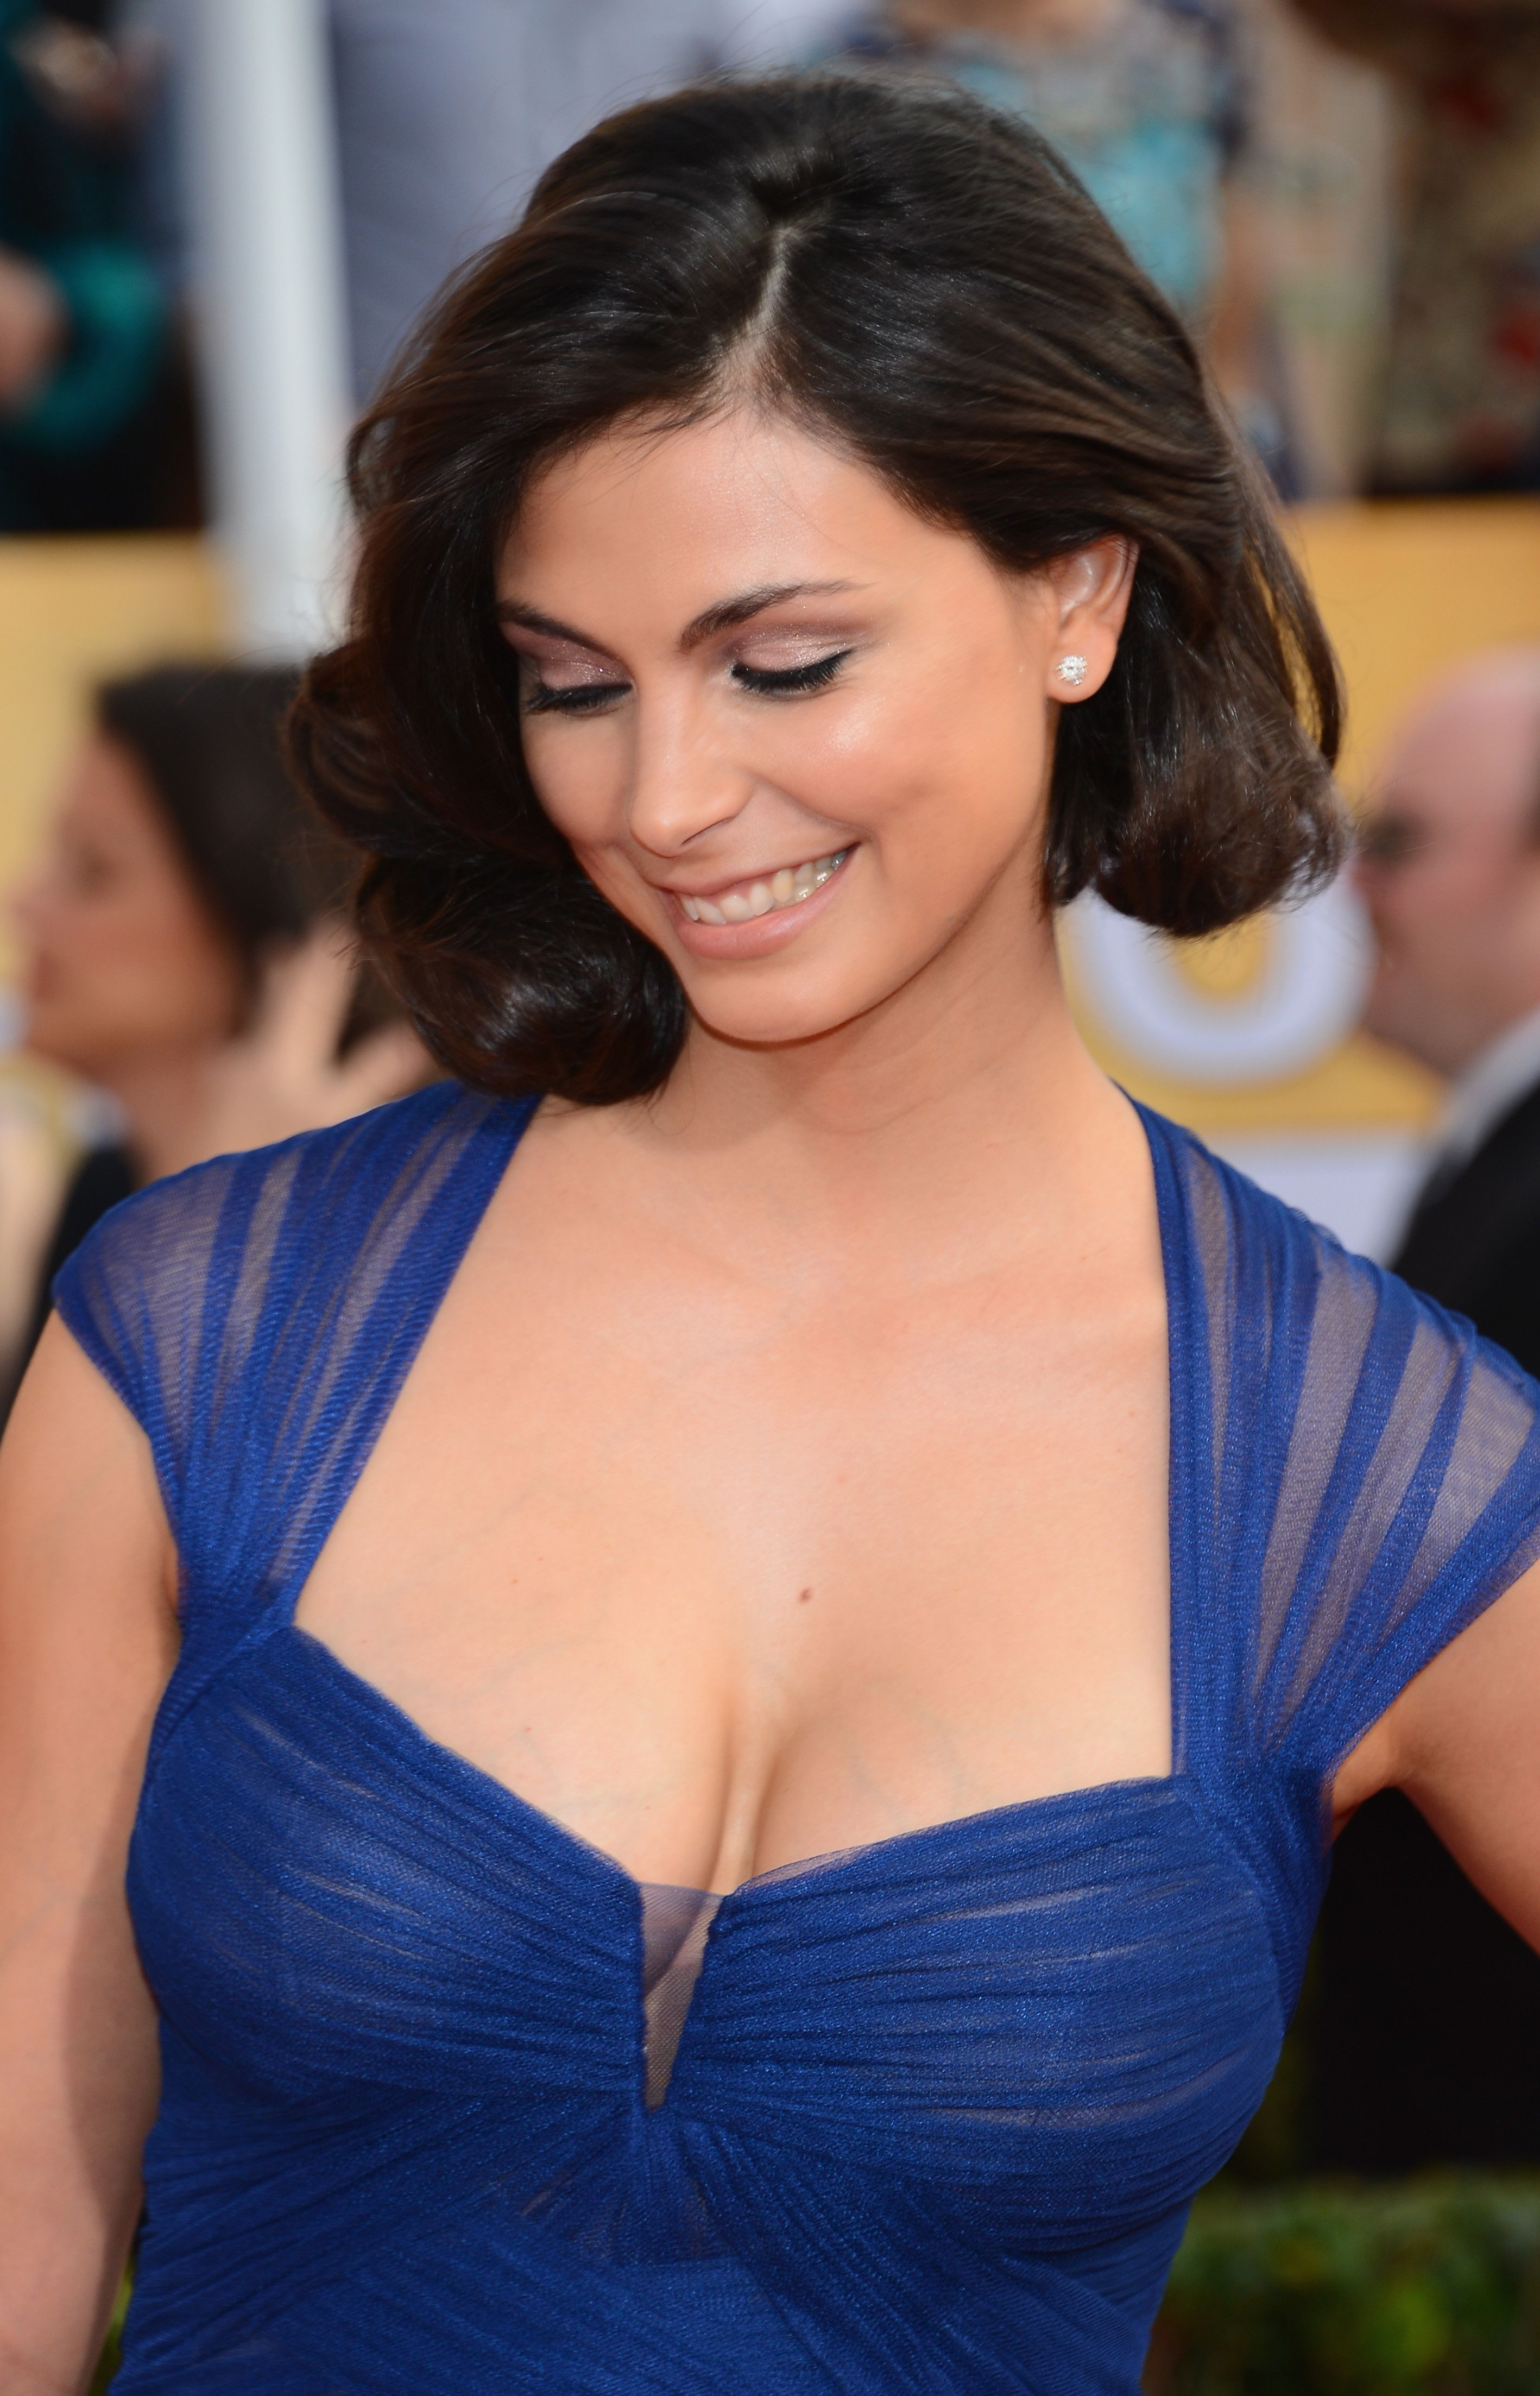 Celebrites Morena Baccarin nude photos 2019